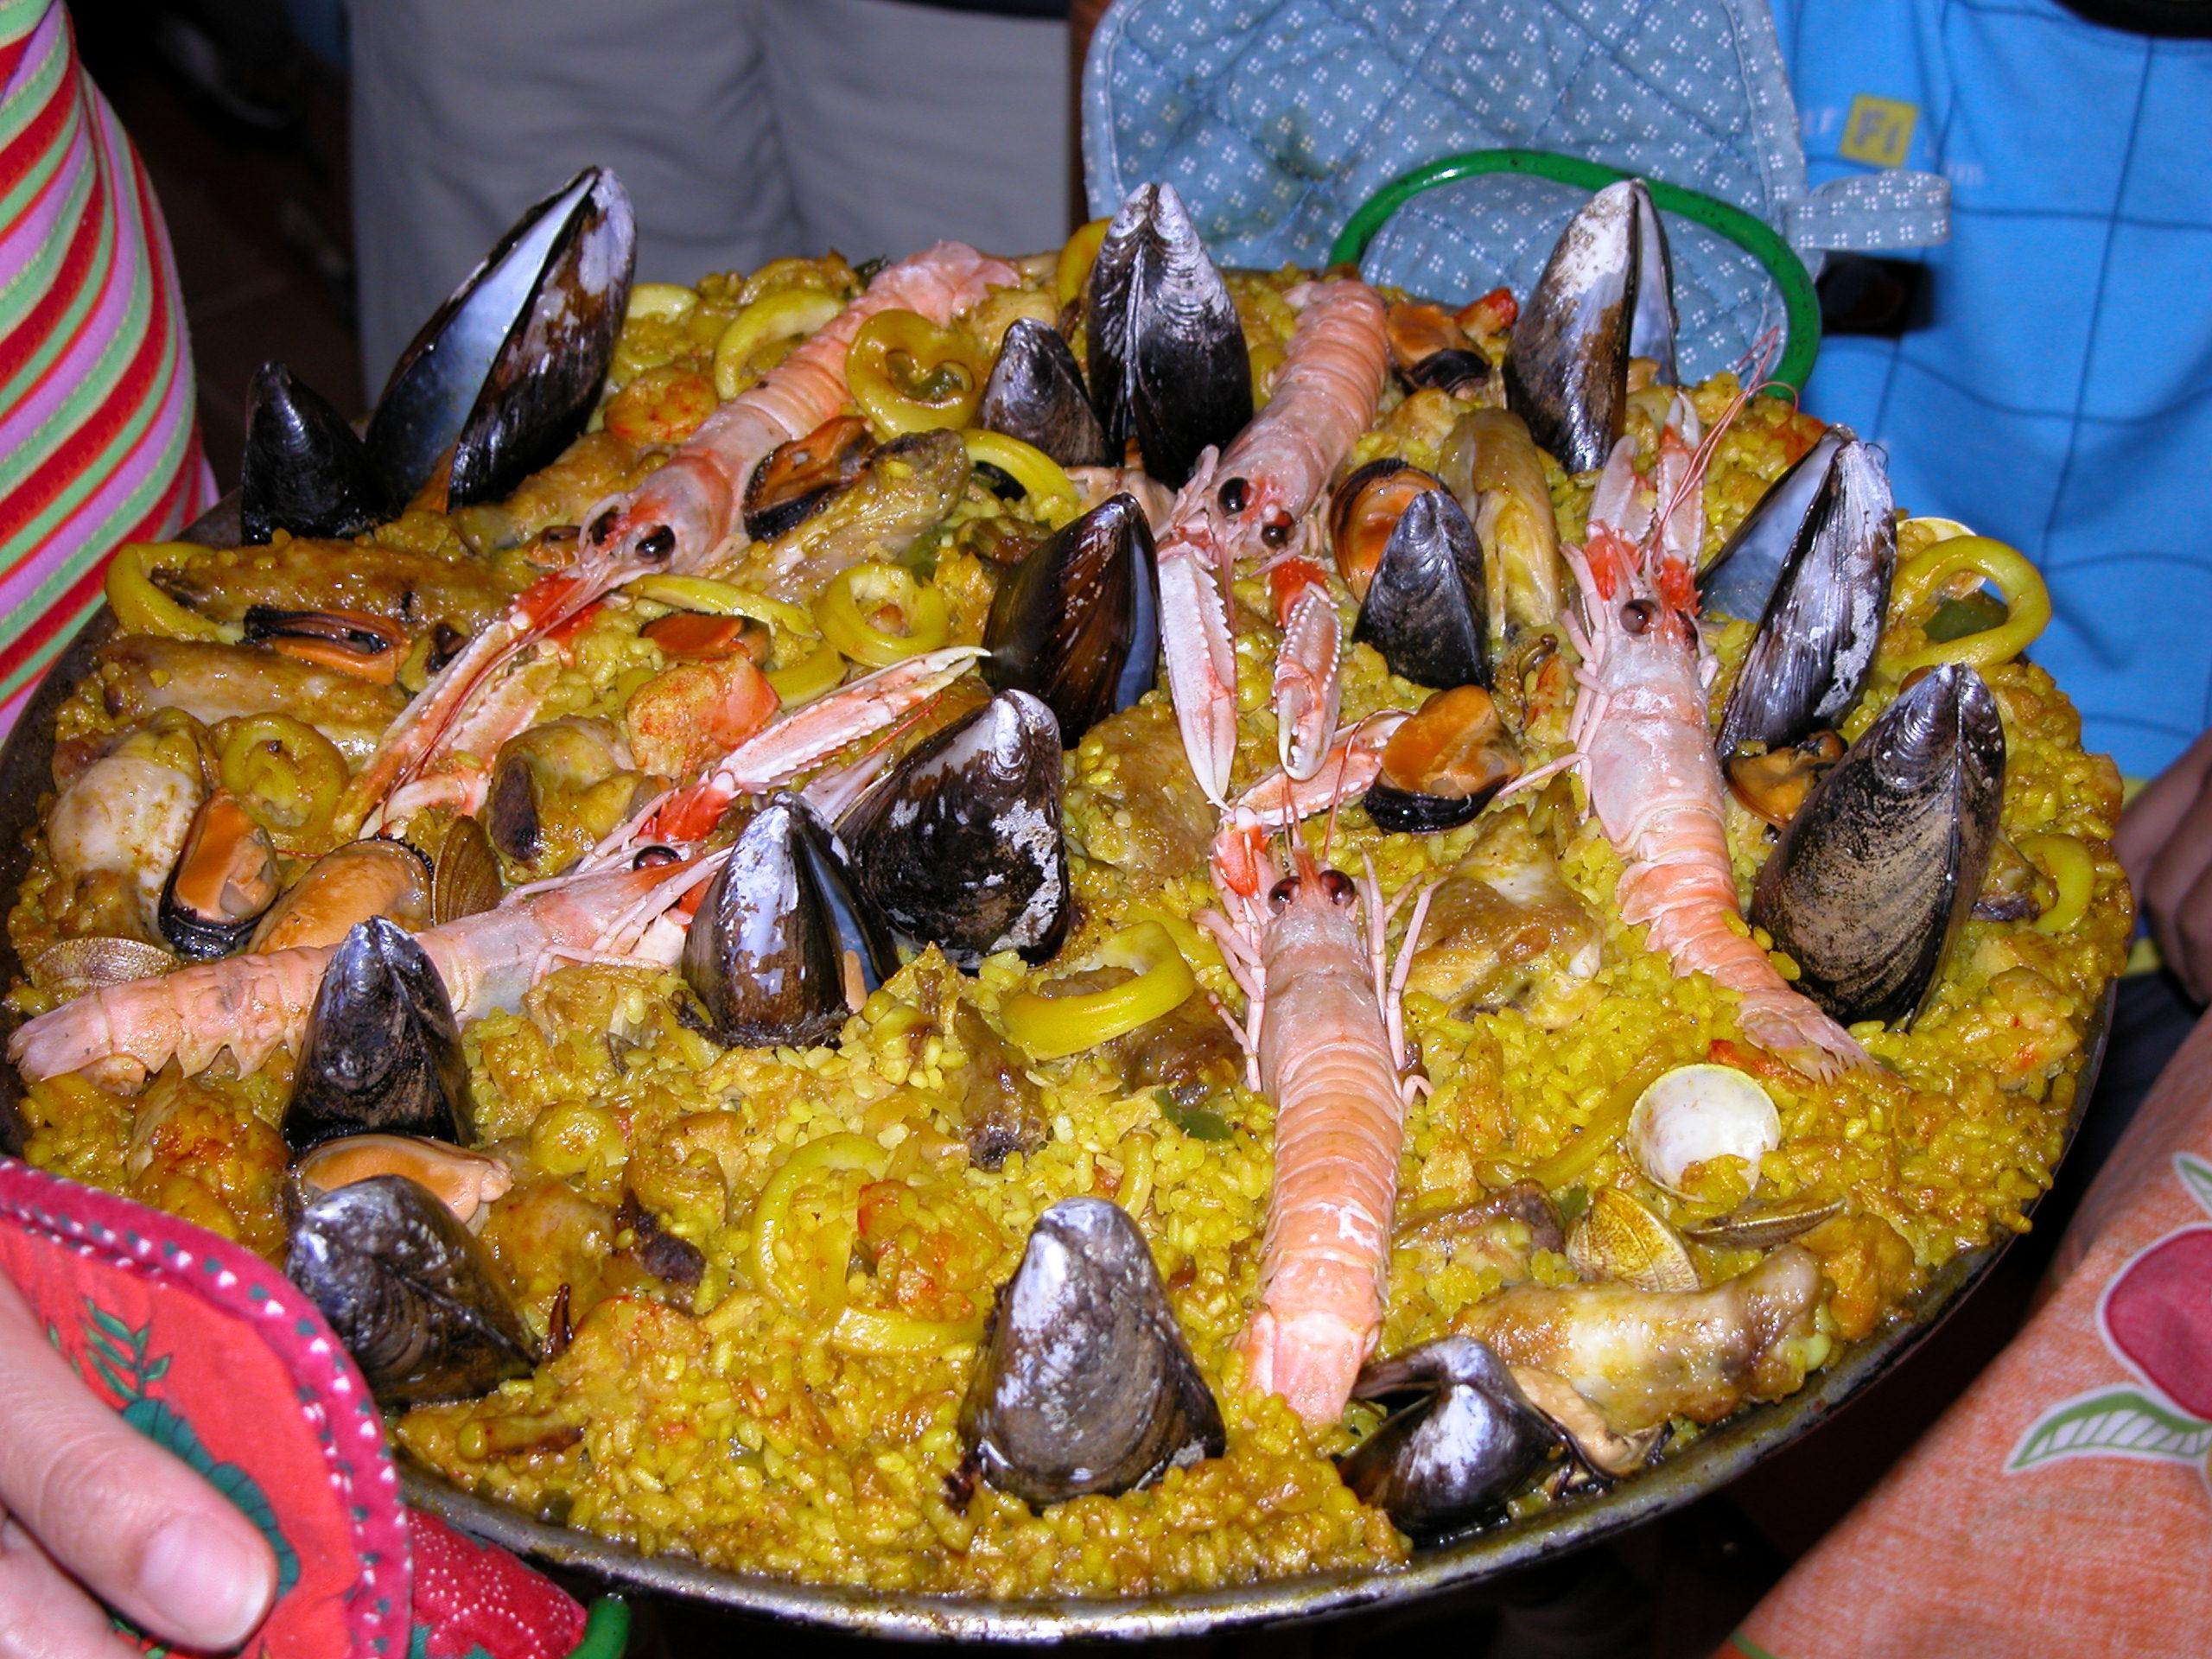 File:Paella Mixta.JPG - Wikimedia Commons